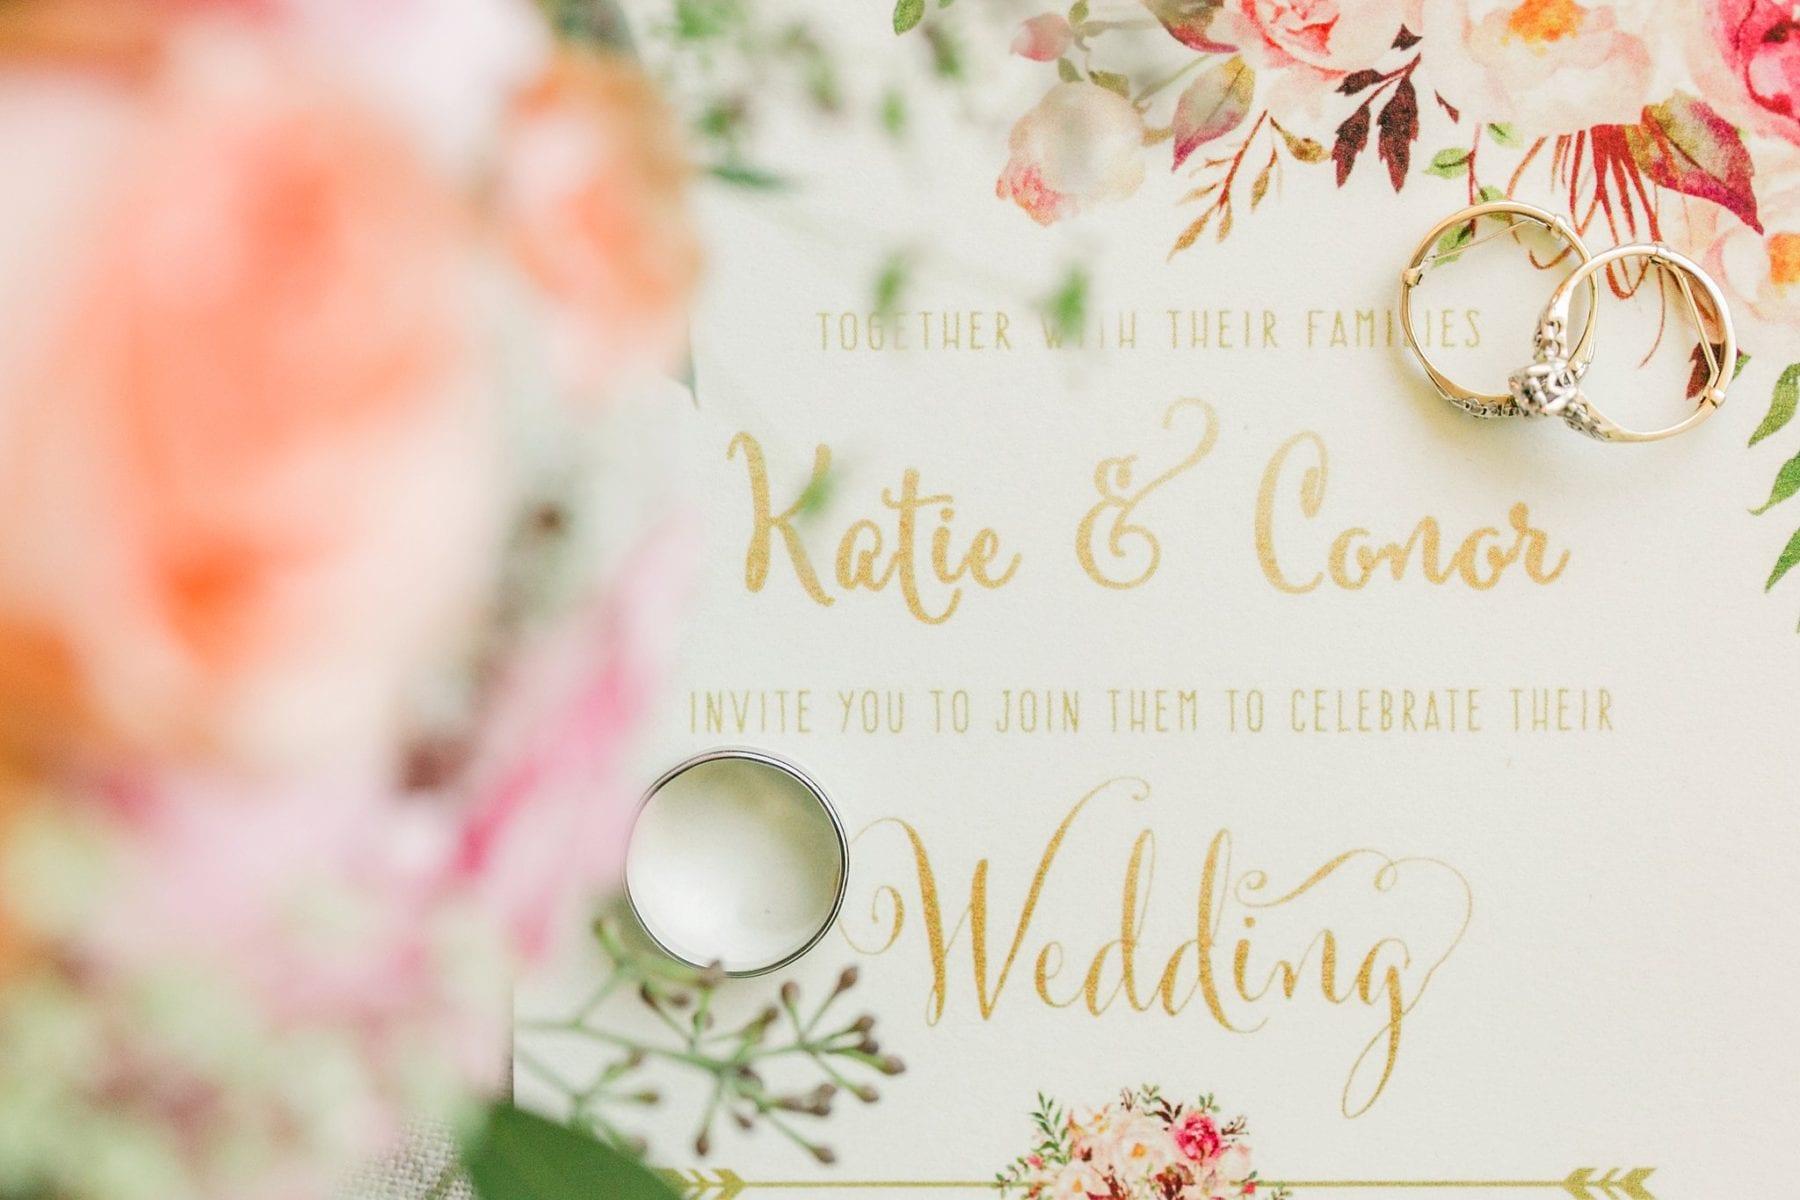 Waters Edge Wedding Photos Maryland Wedding Photographer Megan Kelsey Photography Katie & Conor-32.JPG